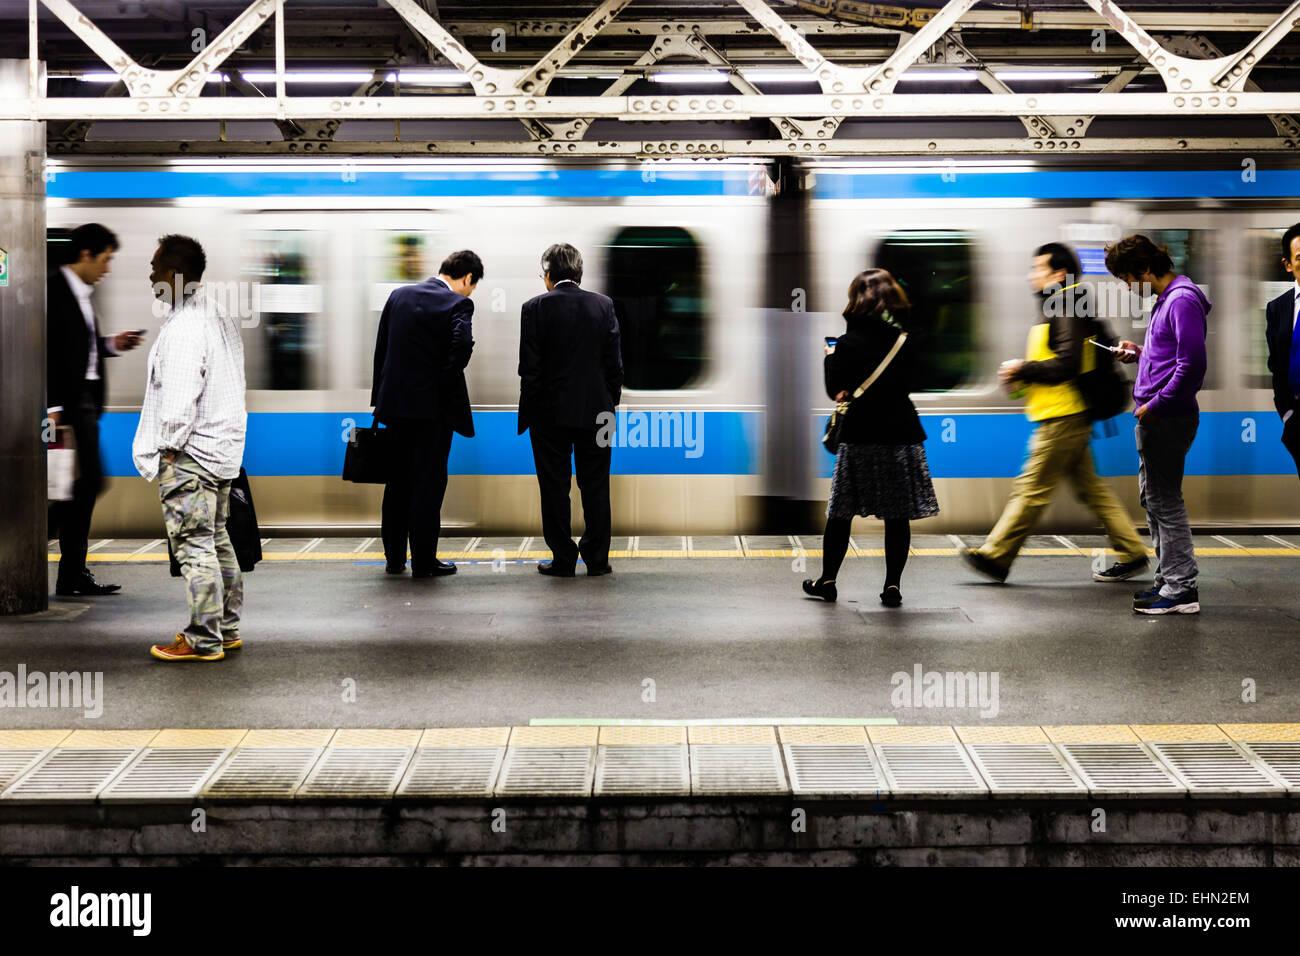 Public transport, Tokyo, Japan. - Stock Image